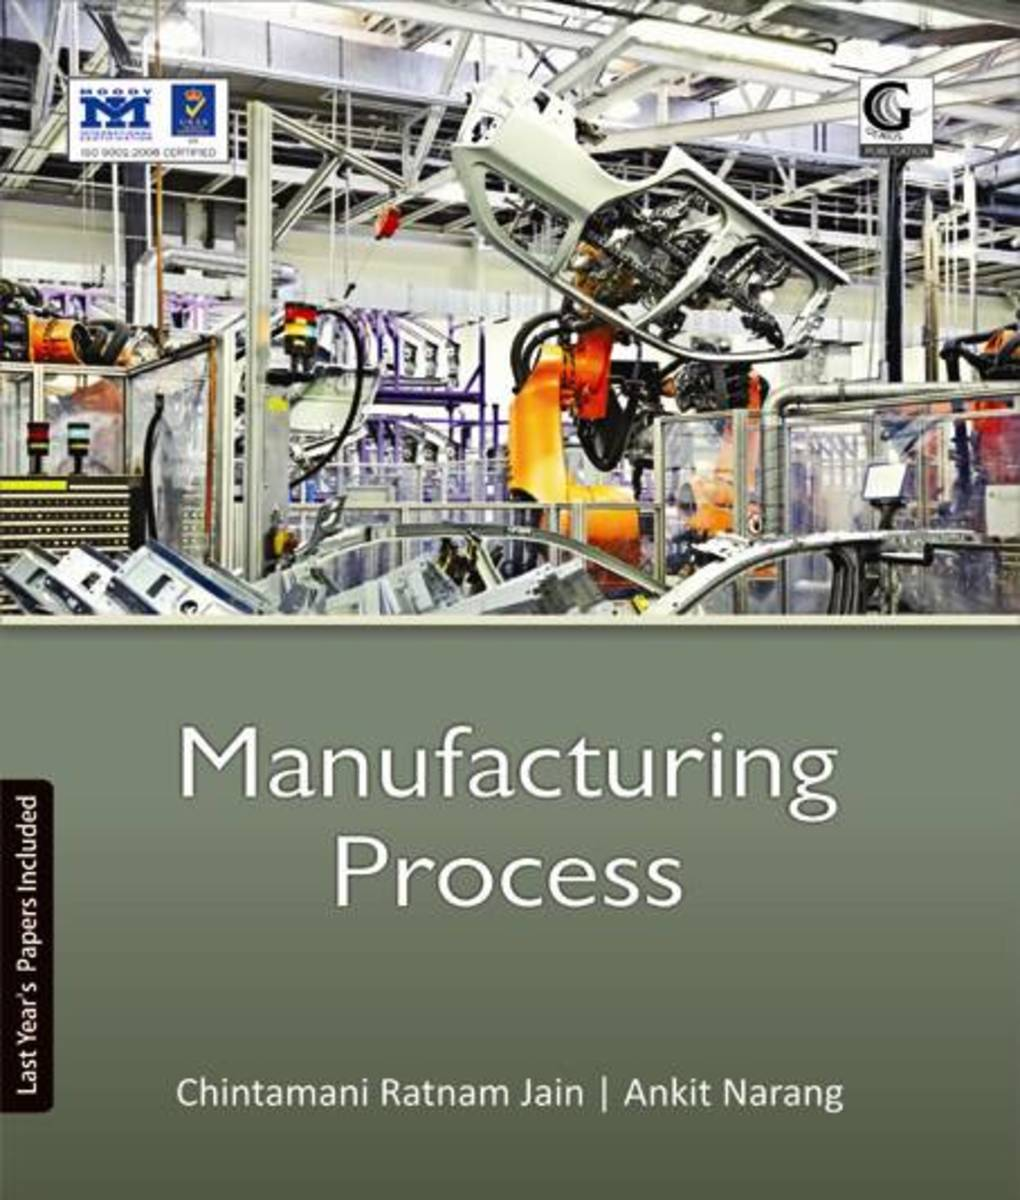 Manufacturing Process Book